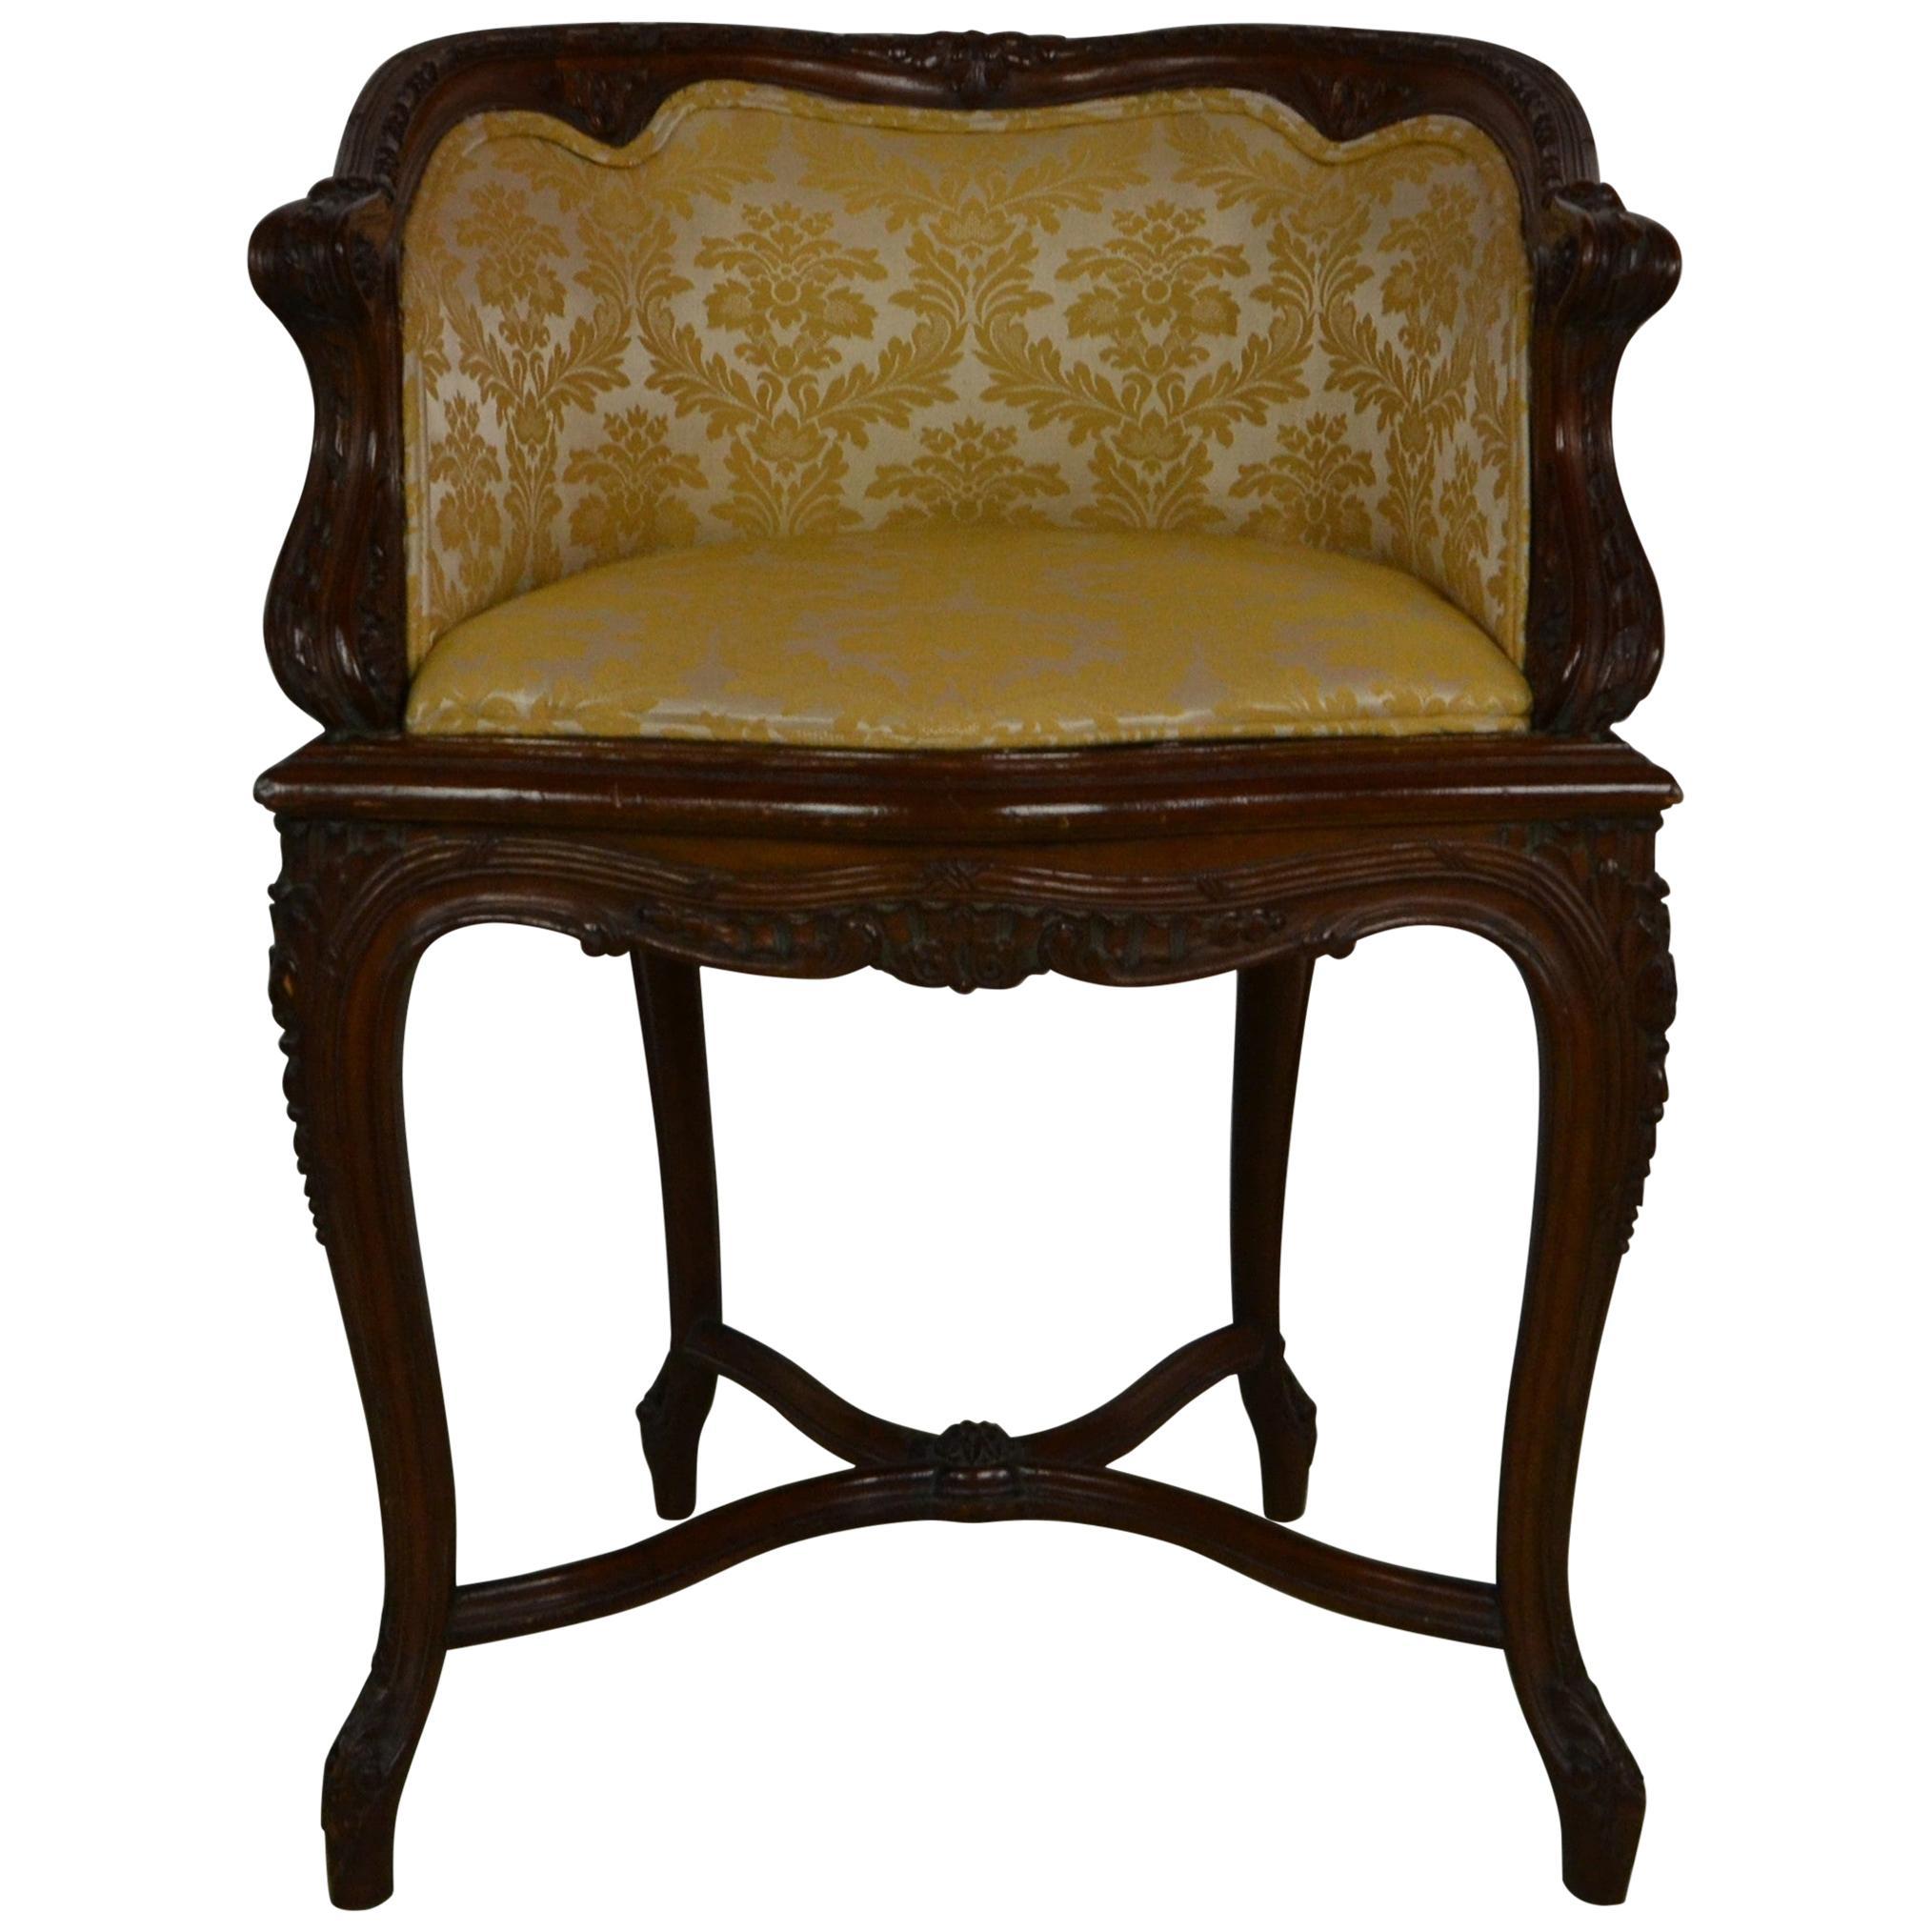 French Louis XV Vanity Chair